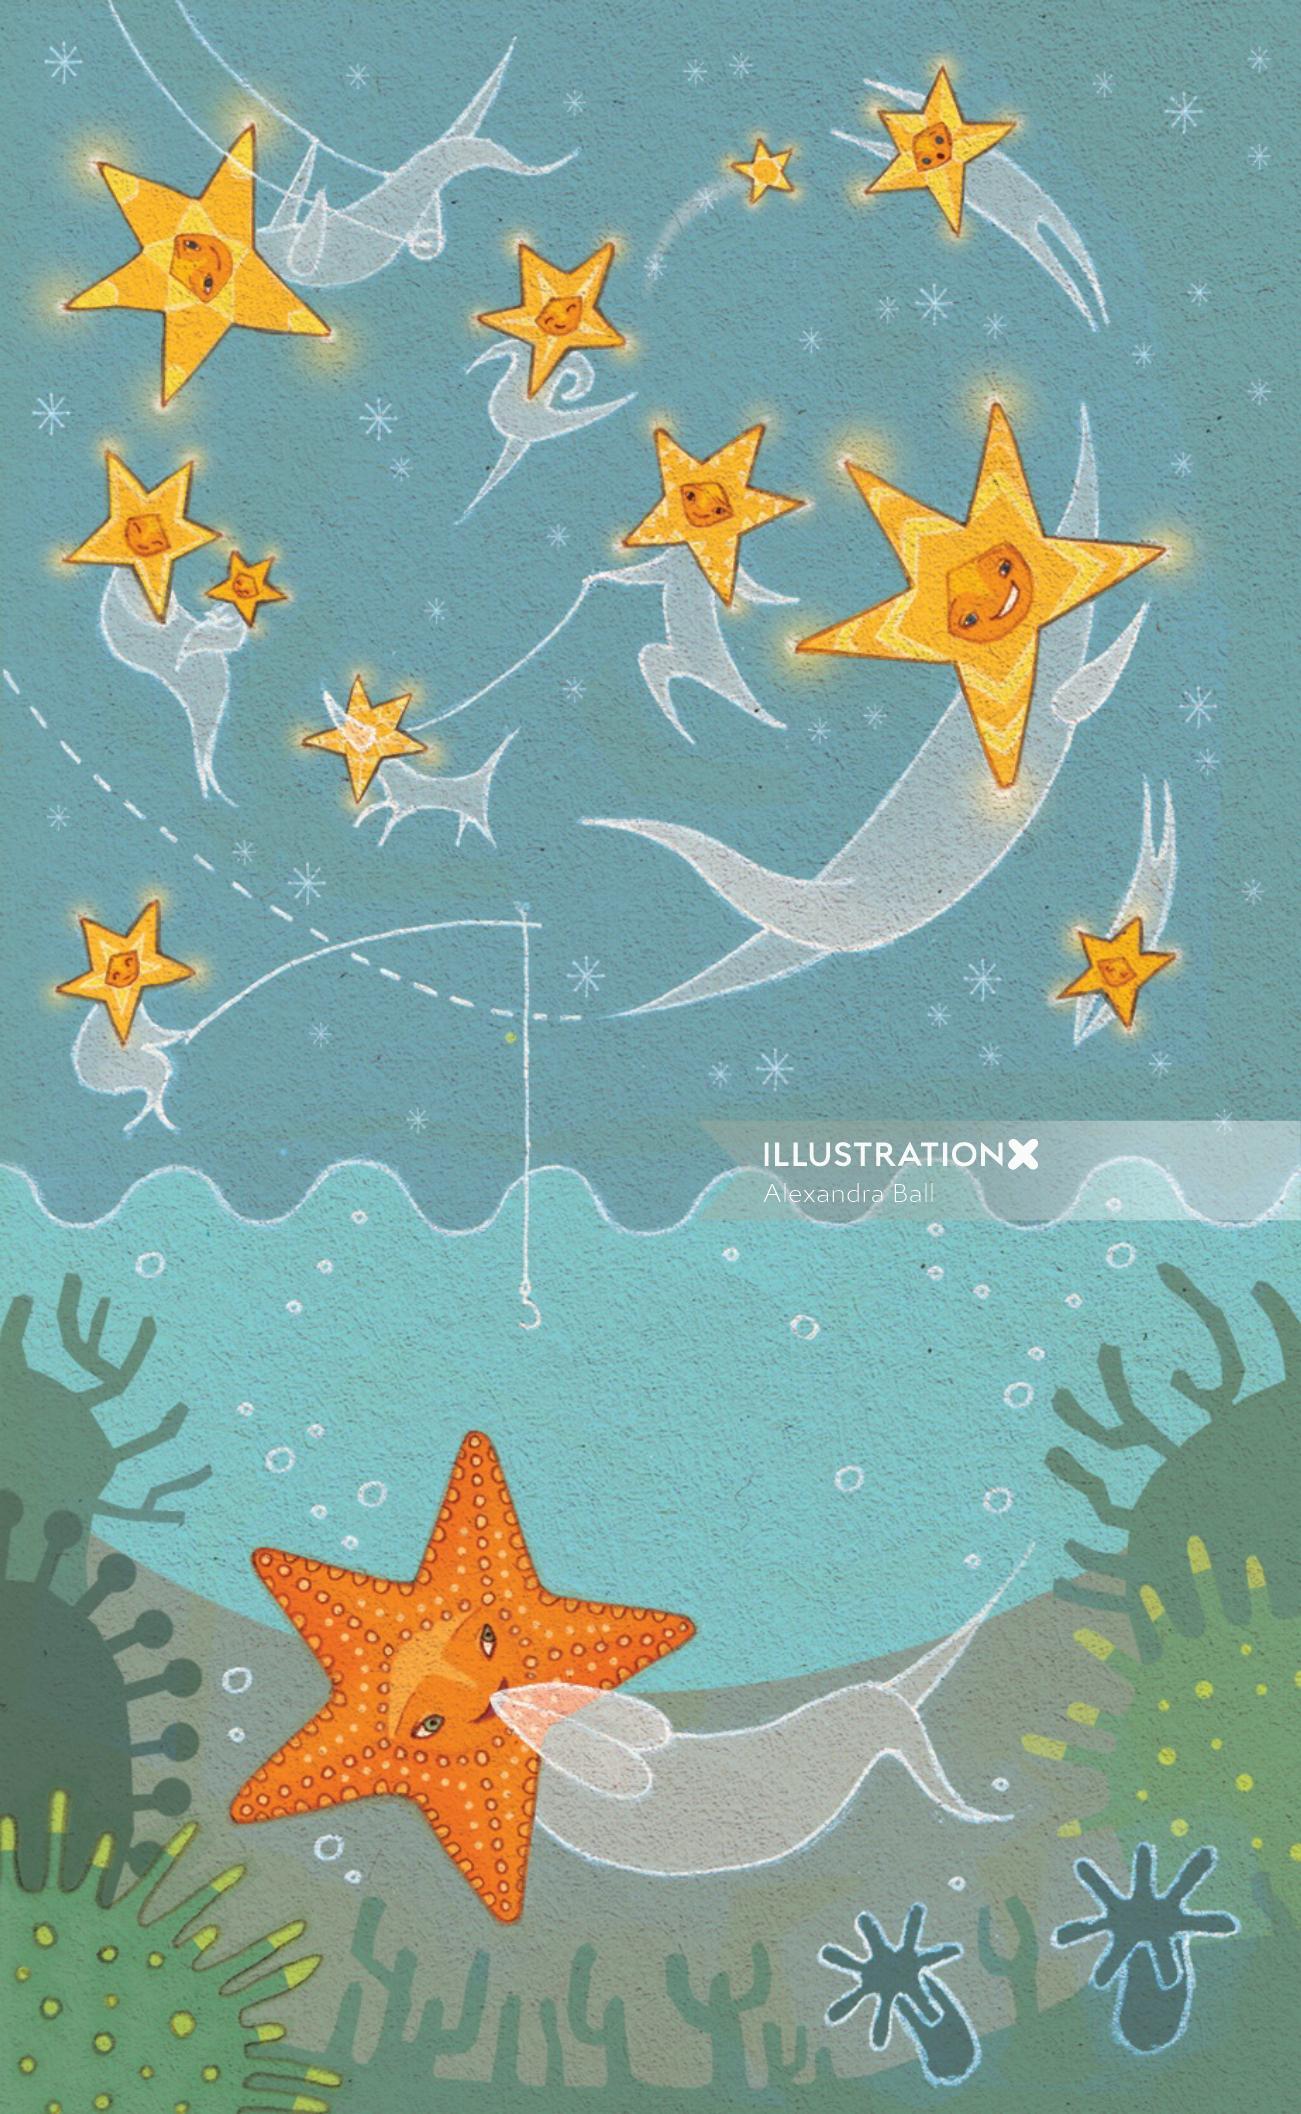 Alexandra Ball: Princess Cruises - Star Illustration